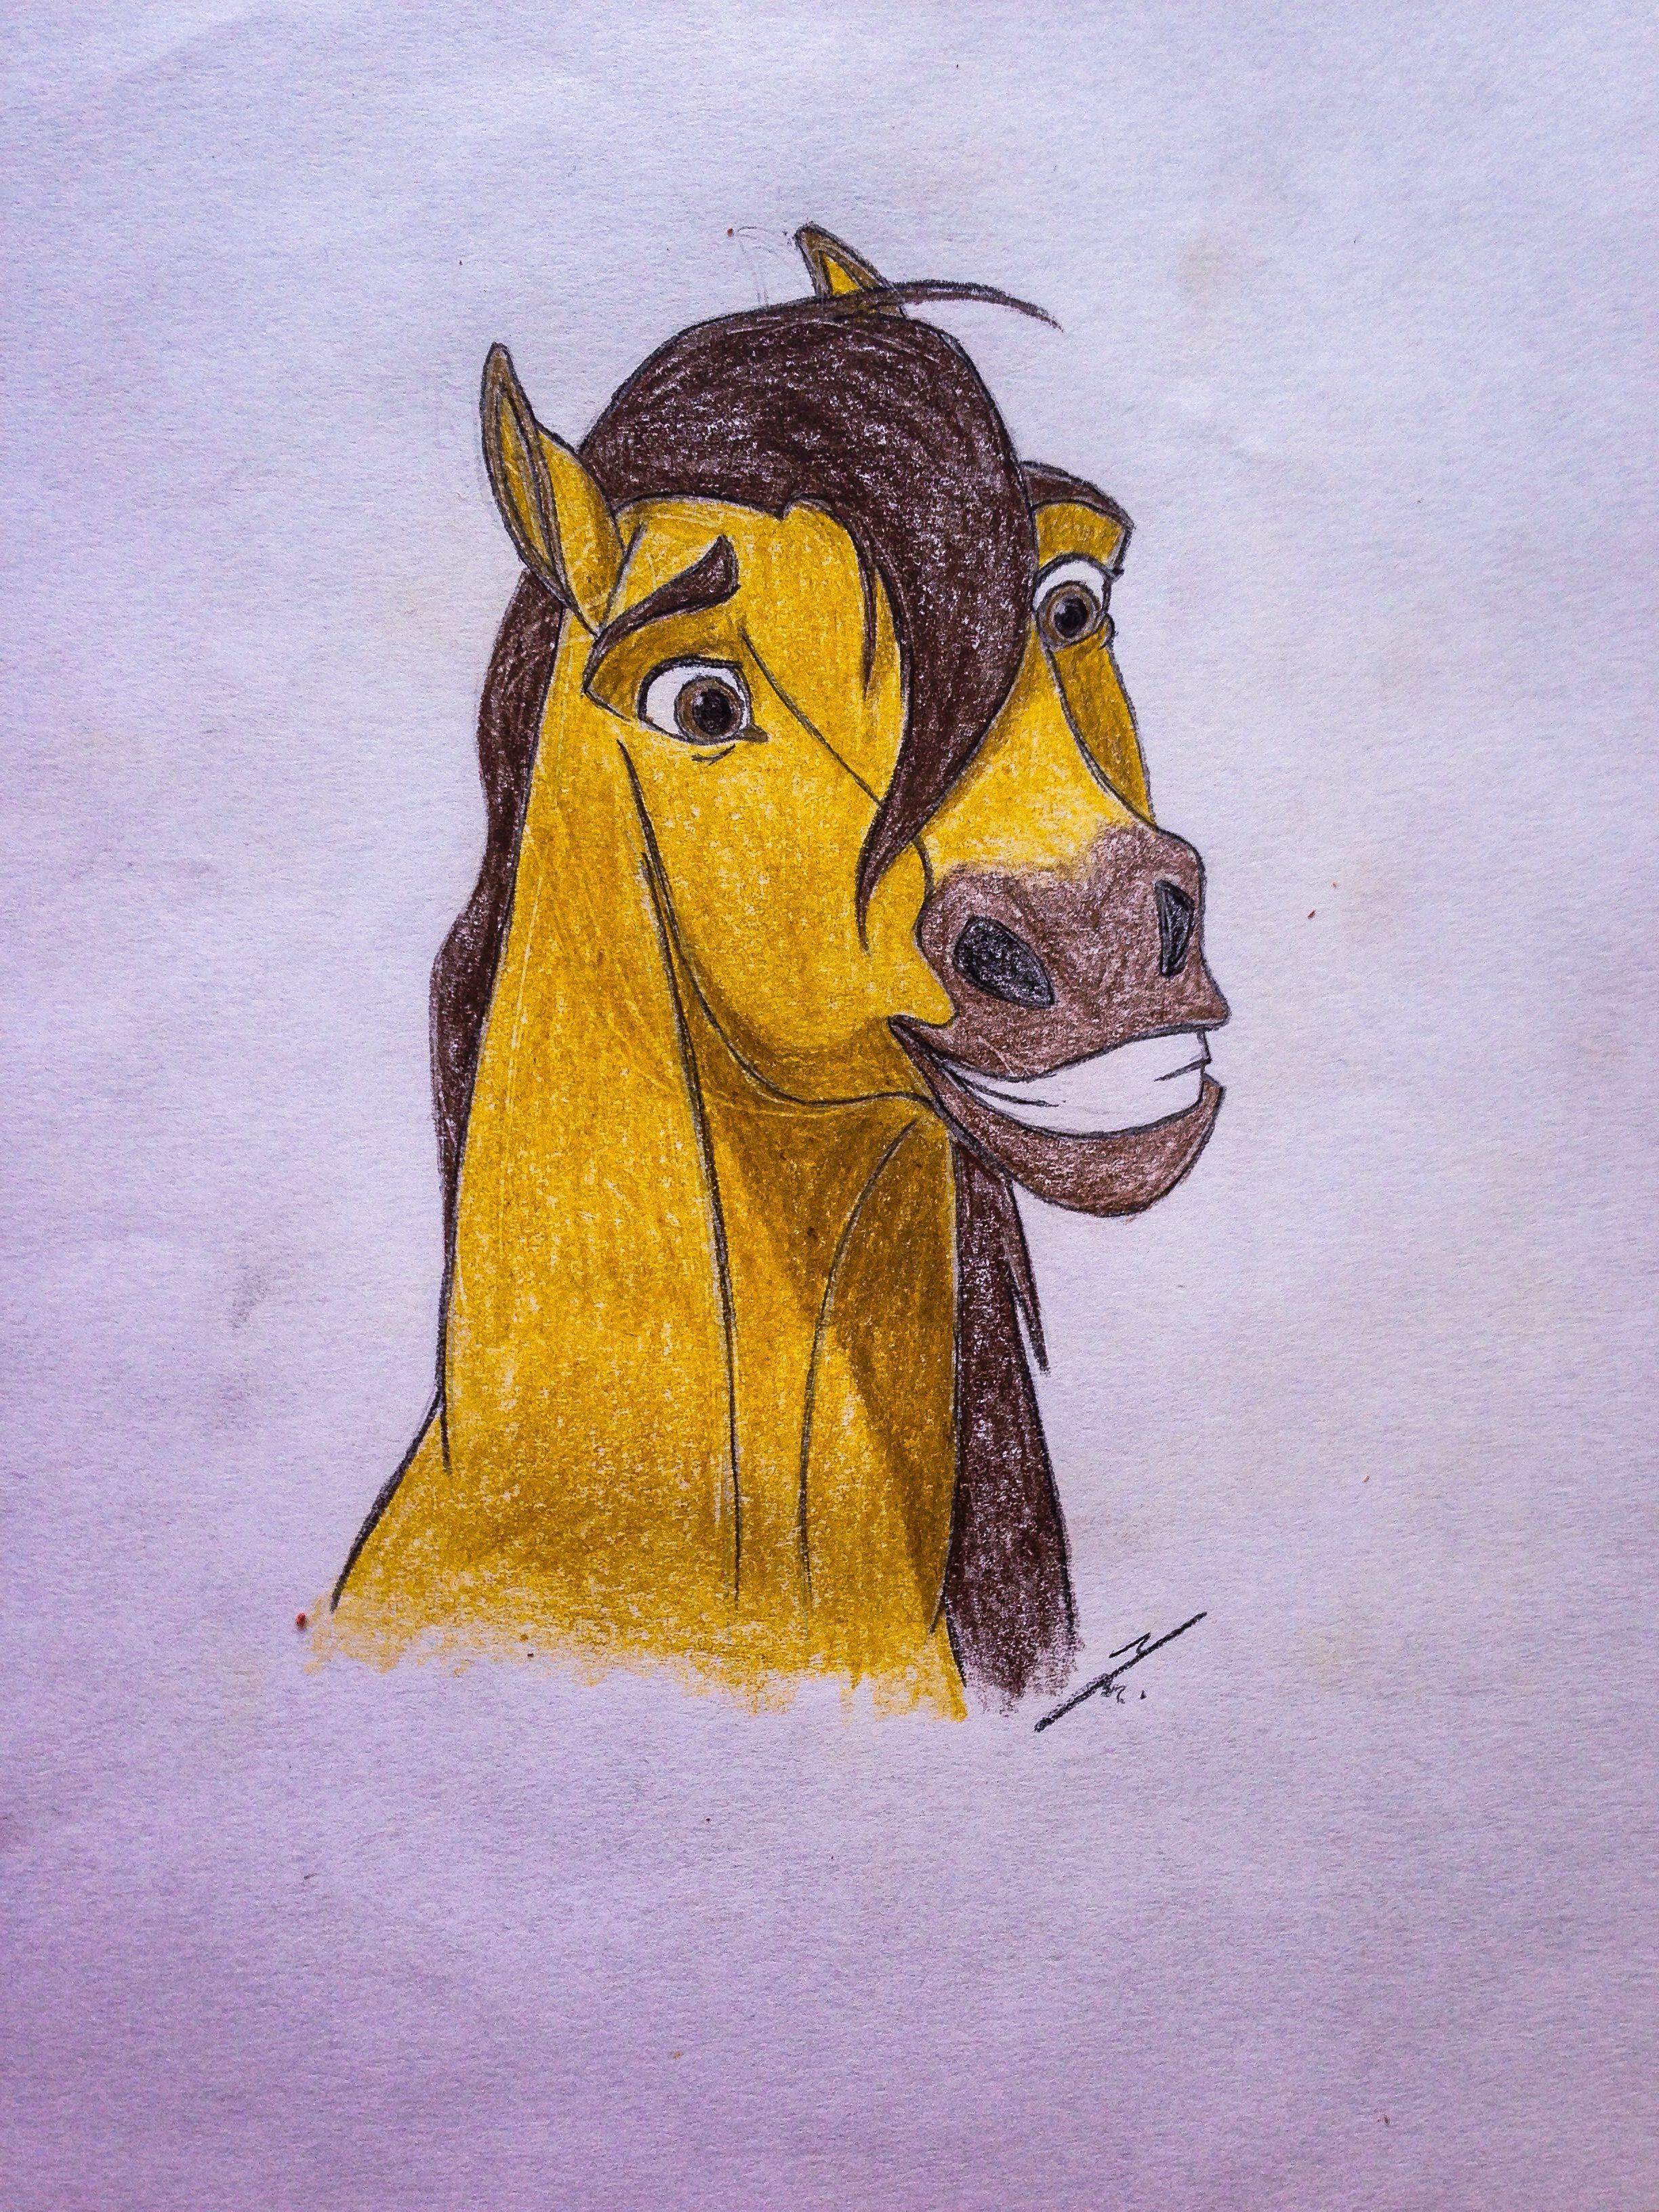 Spirit the stallion of cimarron | SPIRIT | Pinterest ...  Spirit the stal...